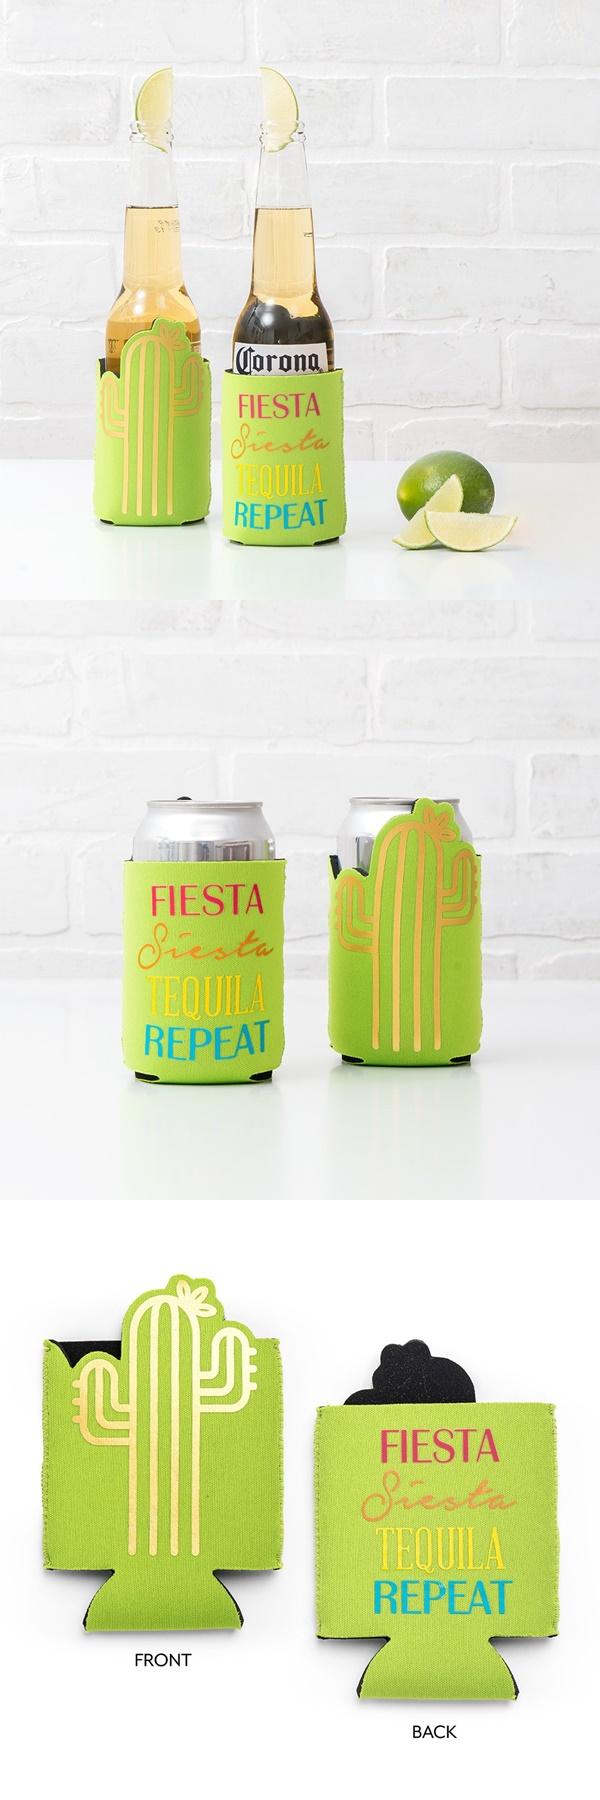 """Fiesta Siesta Tequila"" Cactus Design Neoprene Drink Holder"